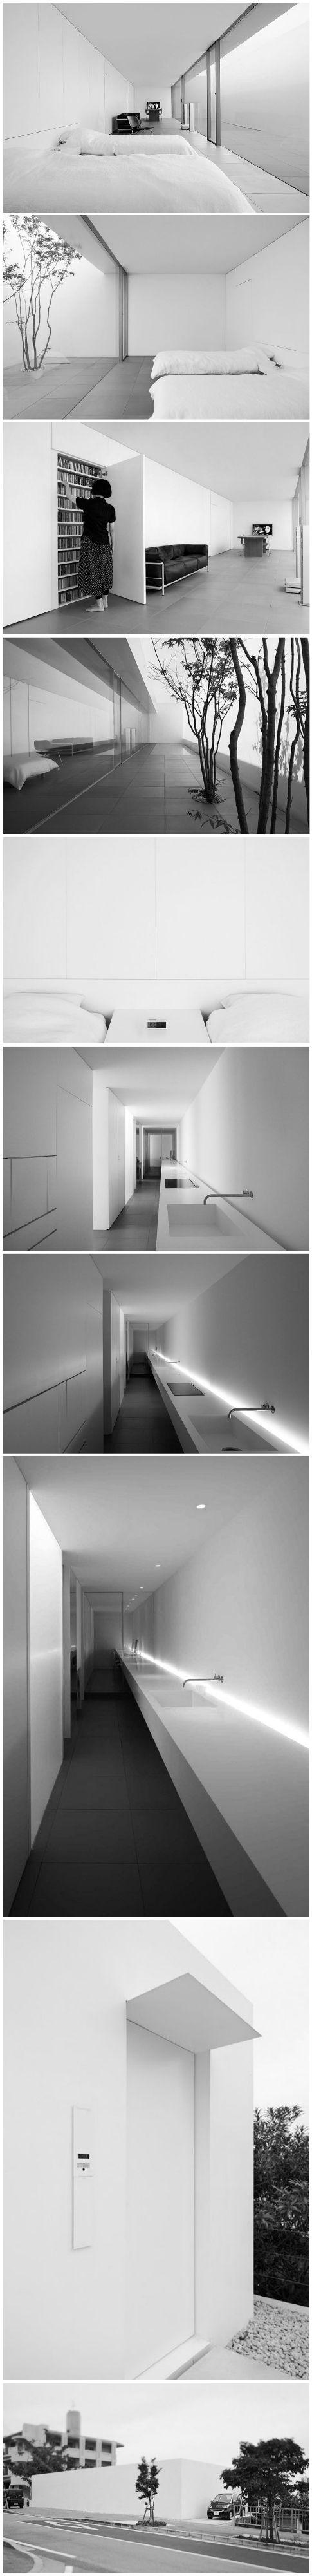 1000 ideas about recuartos on pinterest space saving for Vintage minimalist interior design